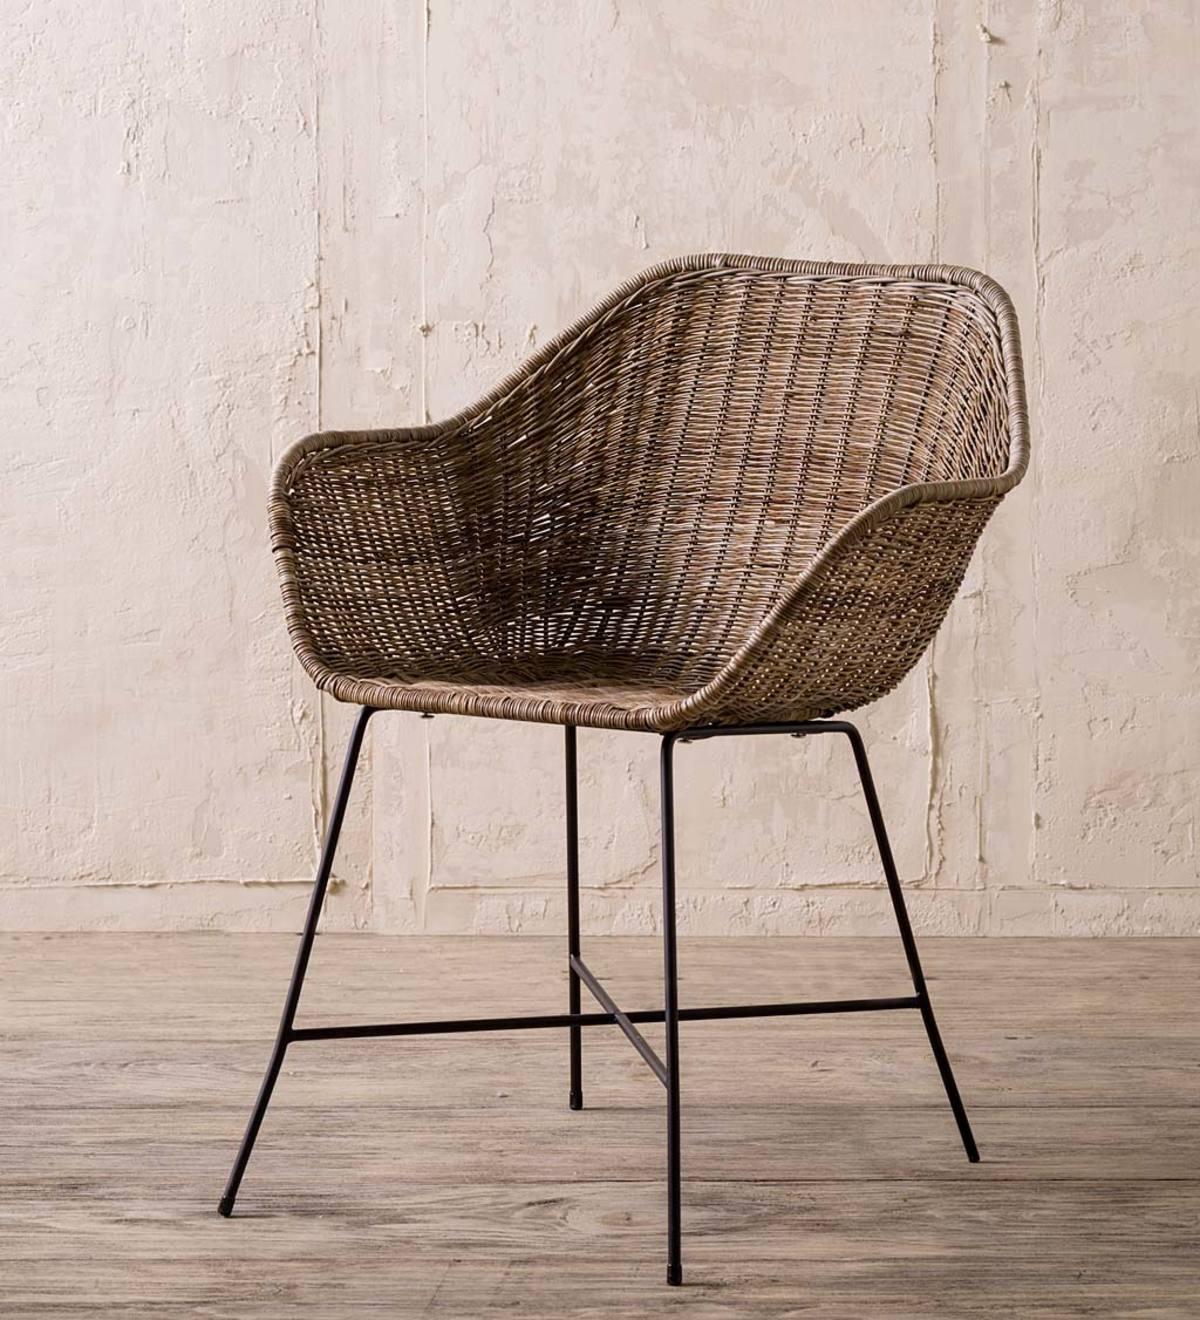 Sensational Mid Century Rattan Woven Chair Vivaterra Bralicious Painted Fabric Chair Ideas Braliciousco